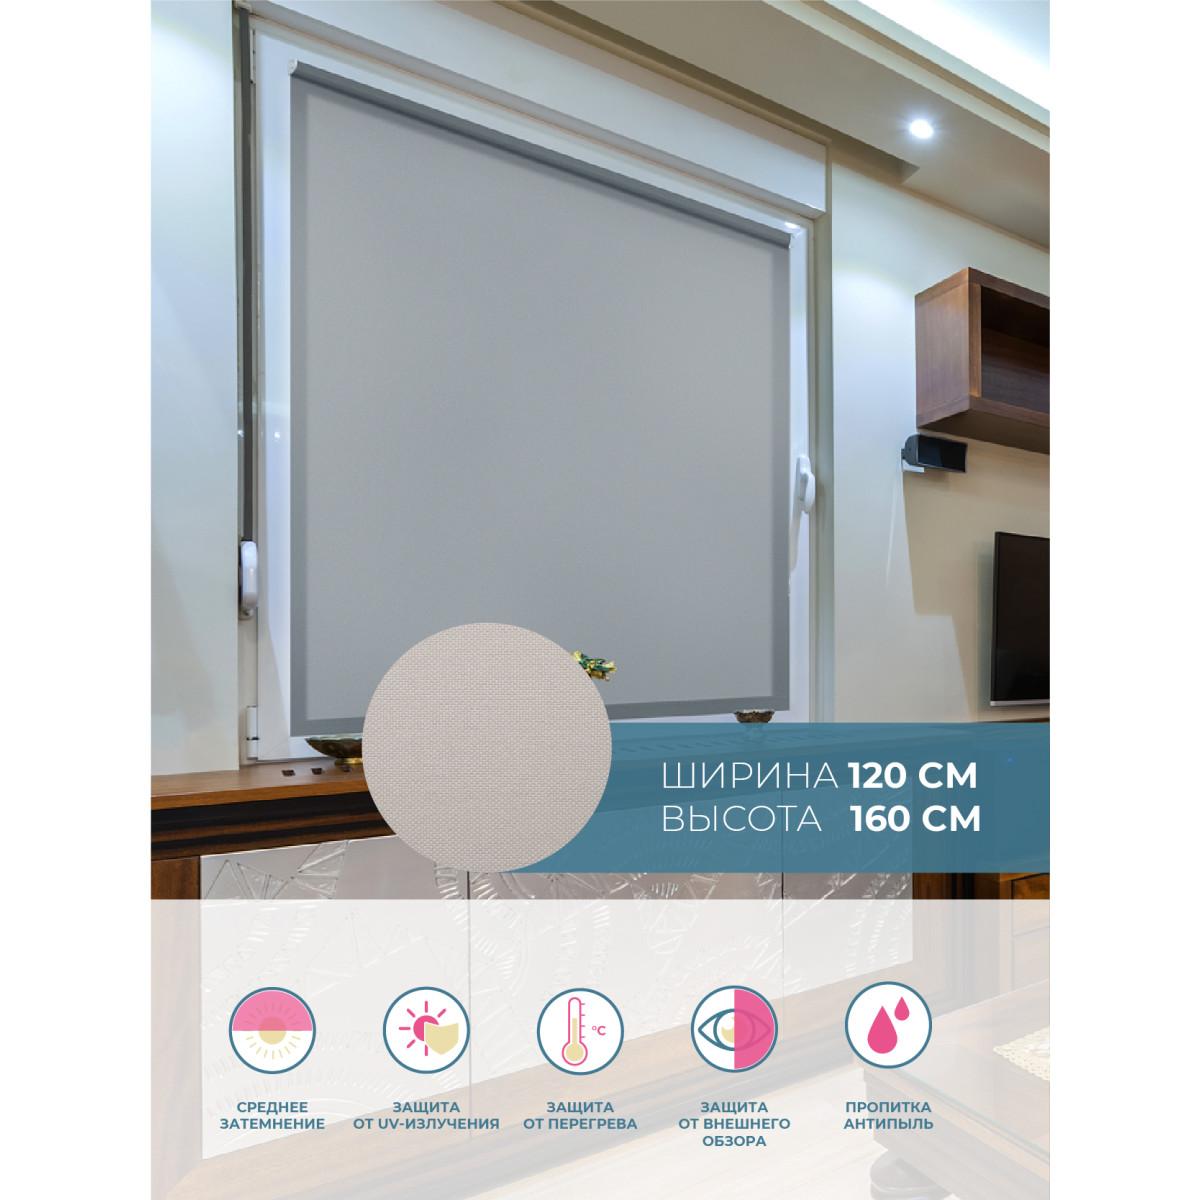 Рулонная Ора Decofest Плайн 120Х160 Цвет Серый